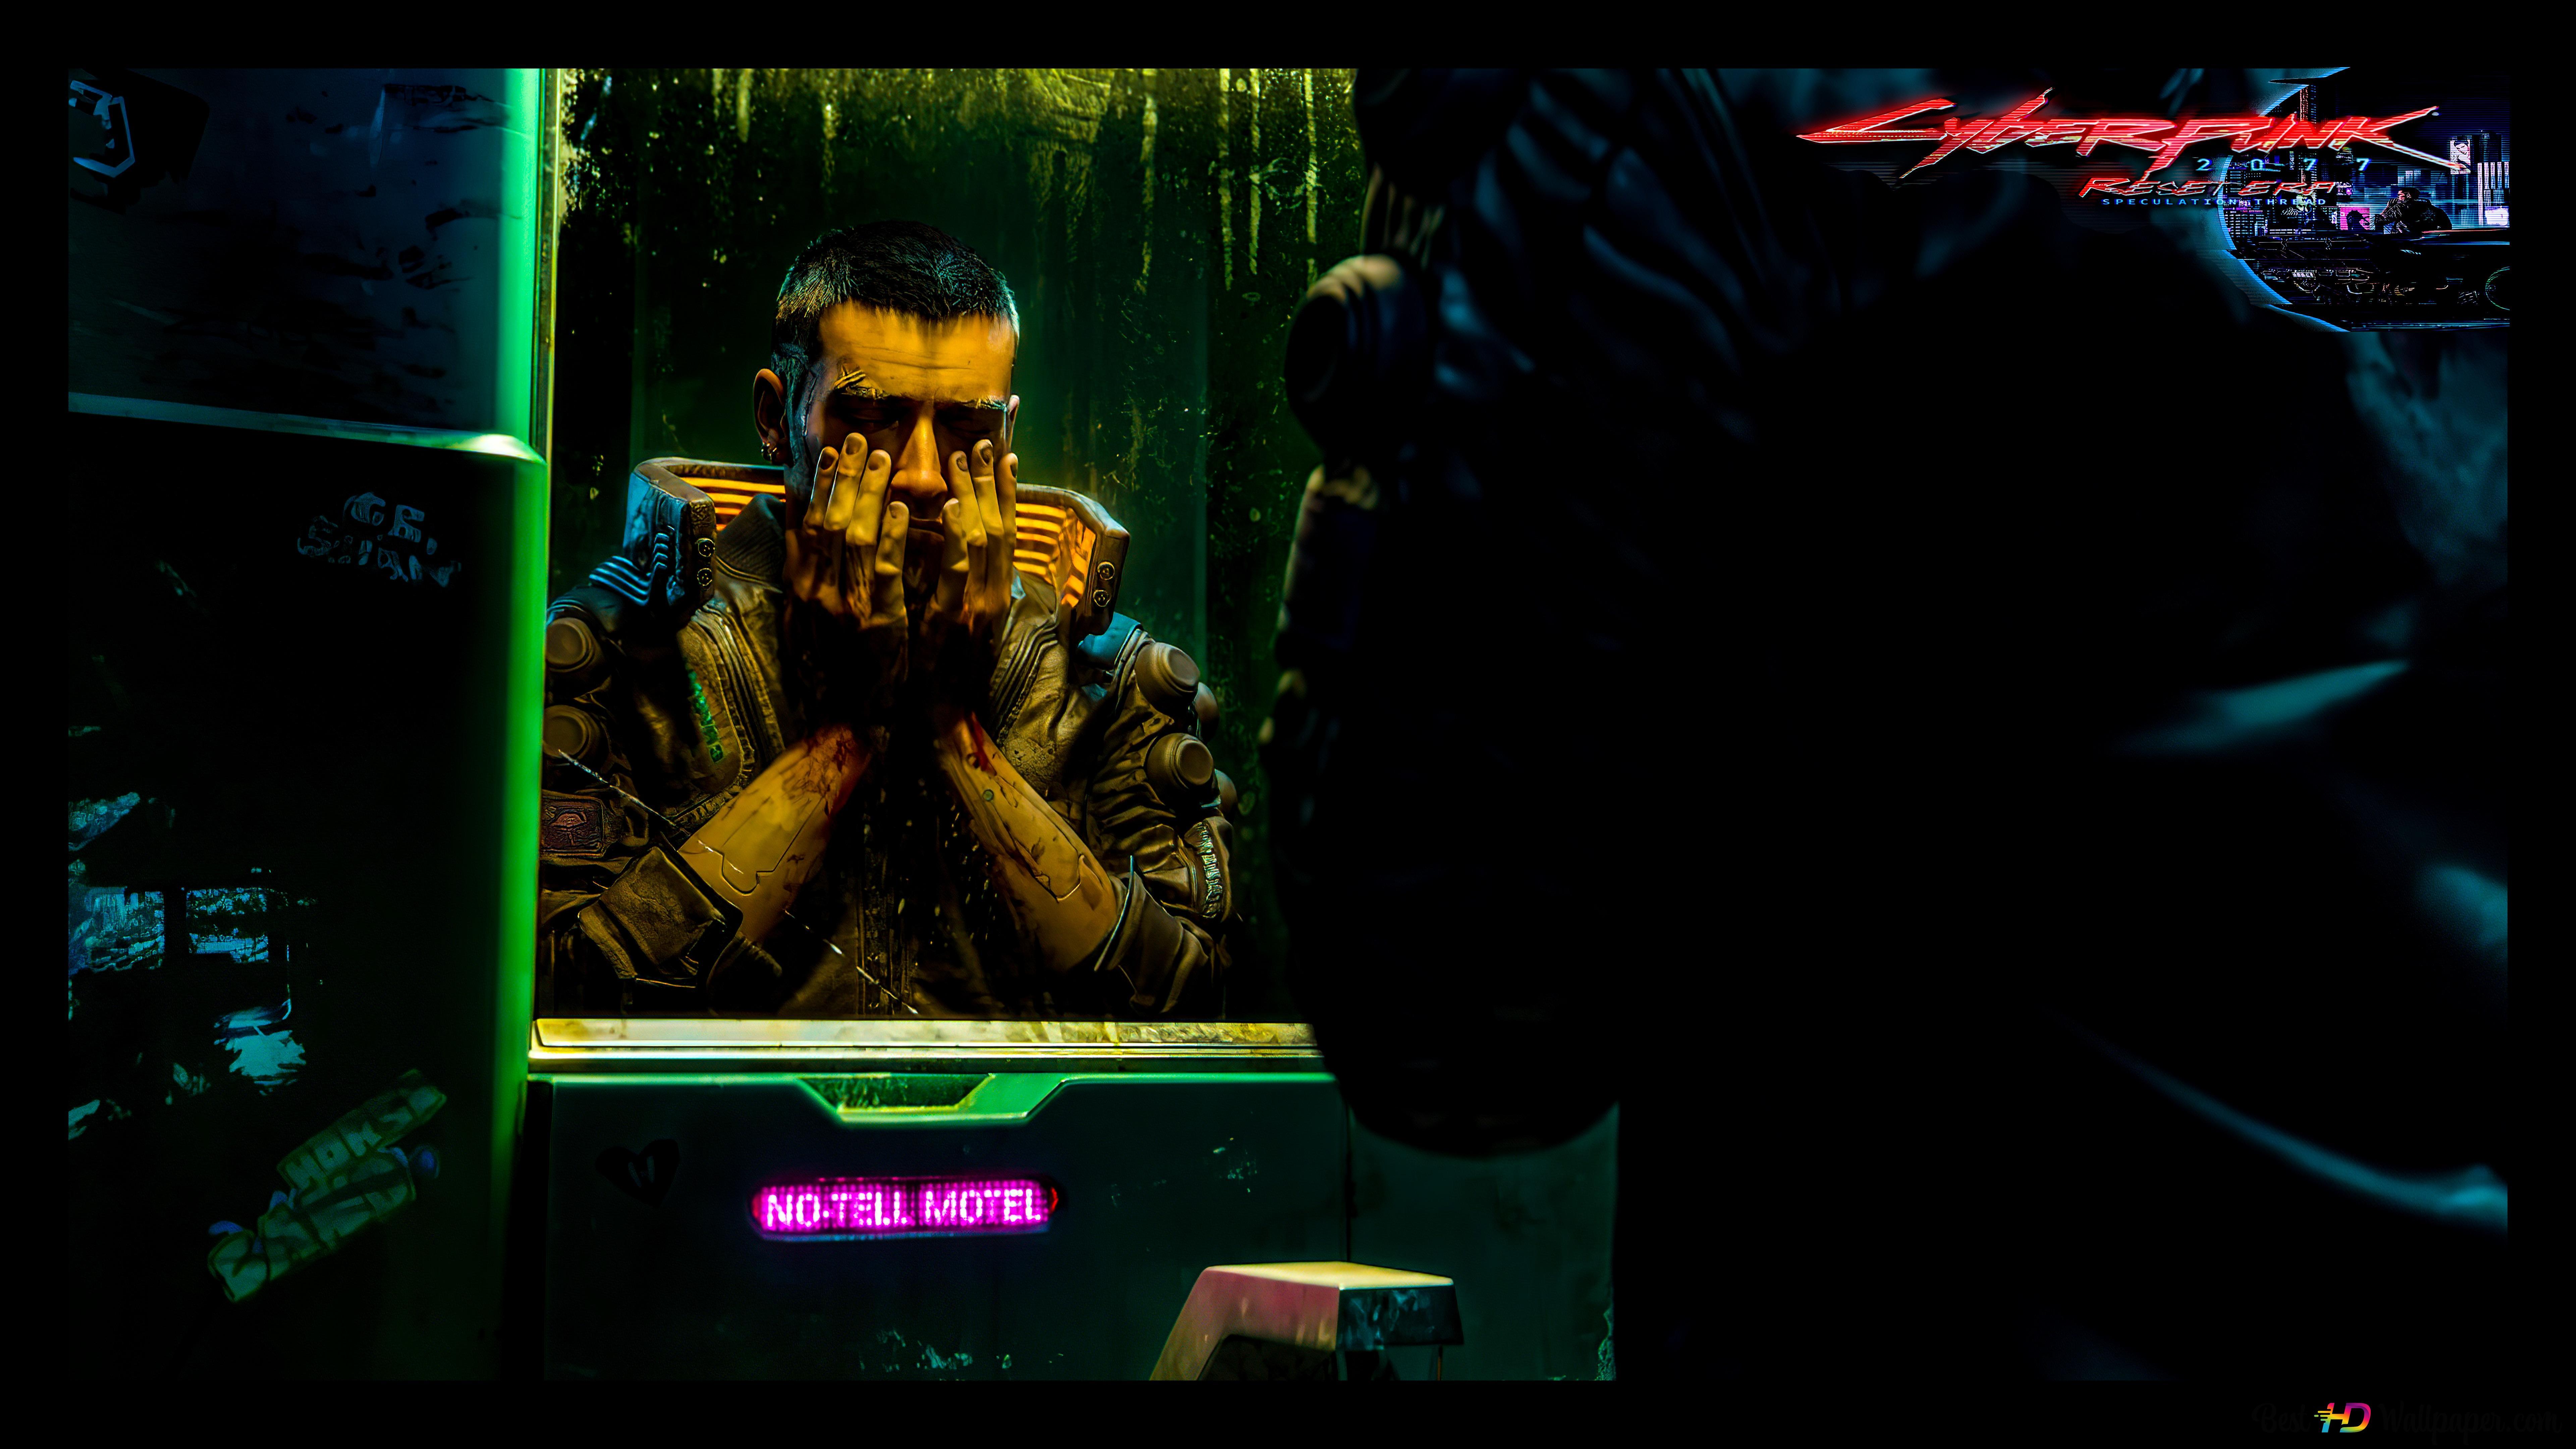 Cyberpunk 2077 Samurai Washing Face 8k 4k Hd Wallpaper Download